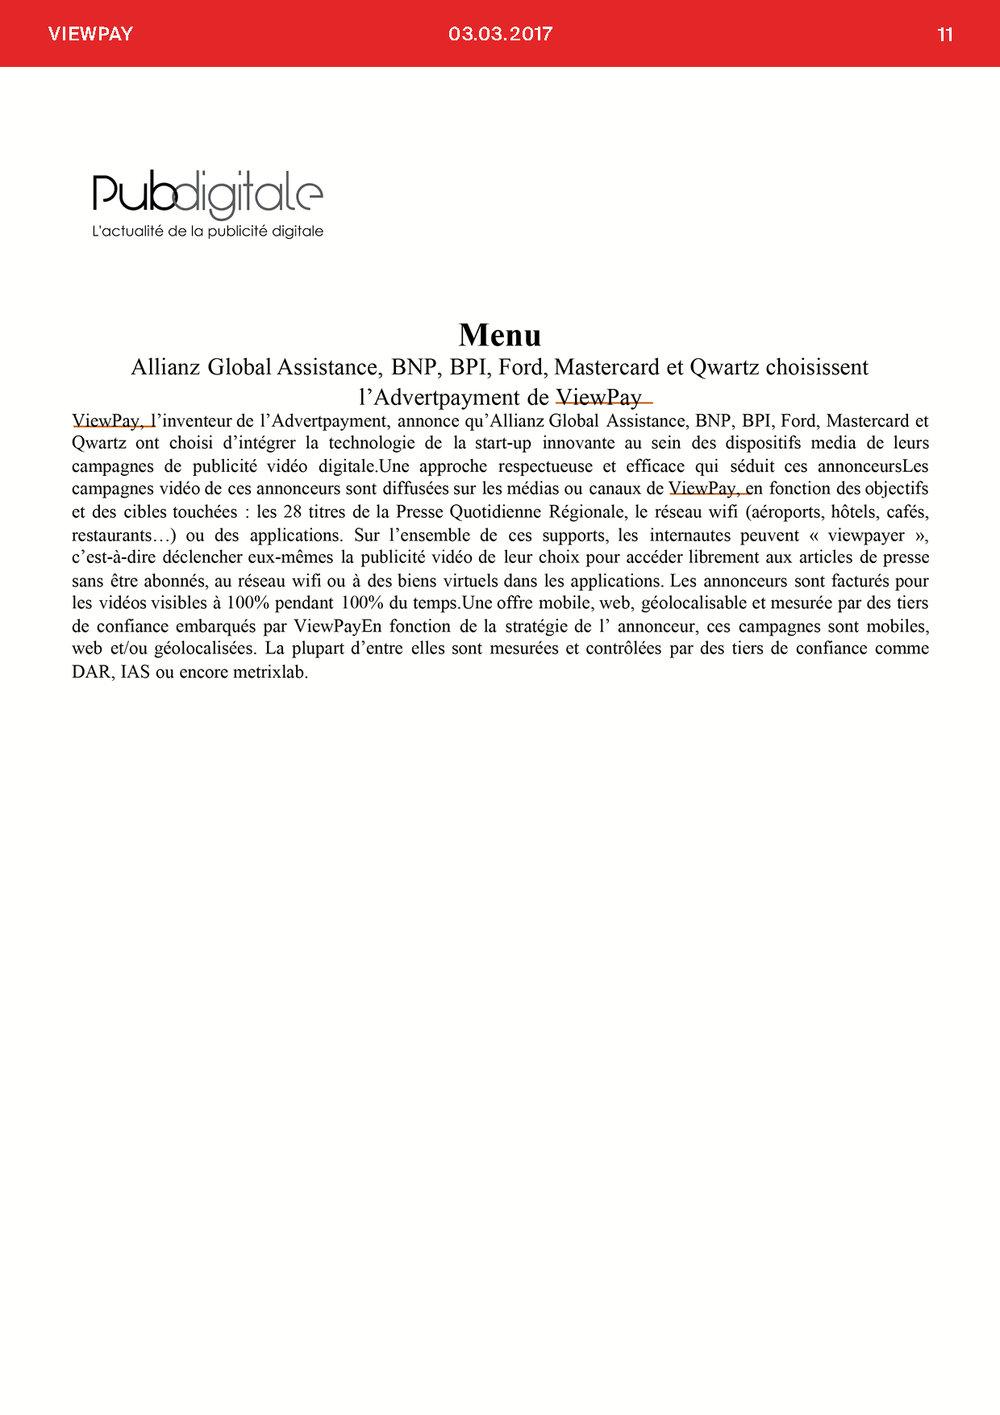 BOOKMEDIA_MARS_WEB11.jpg